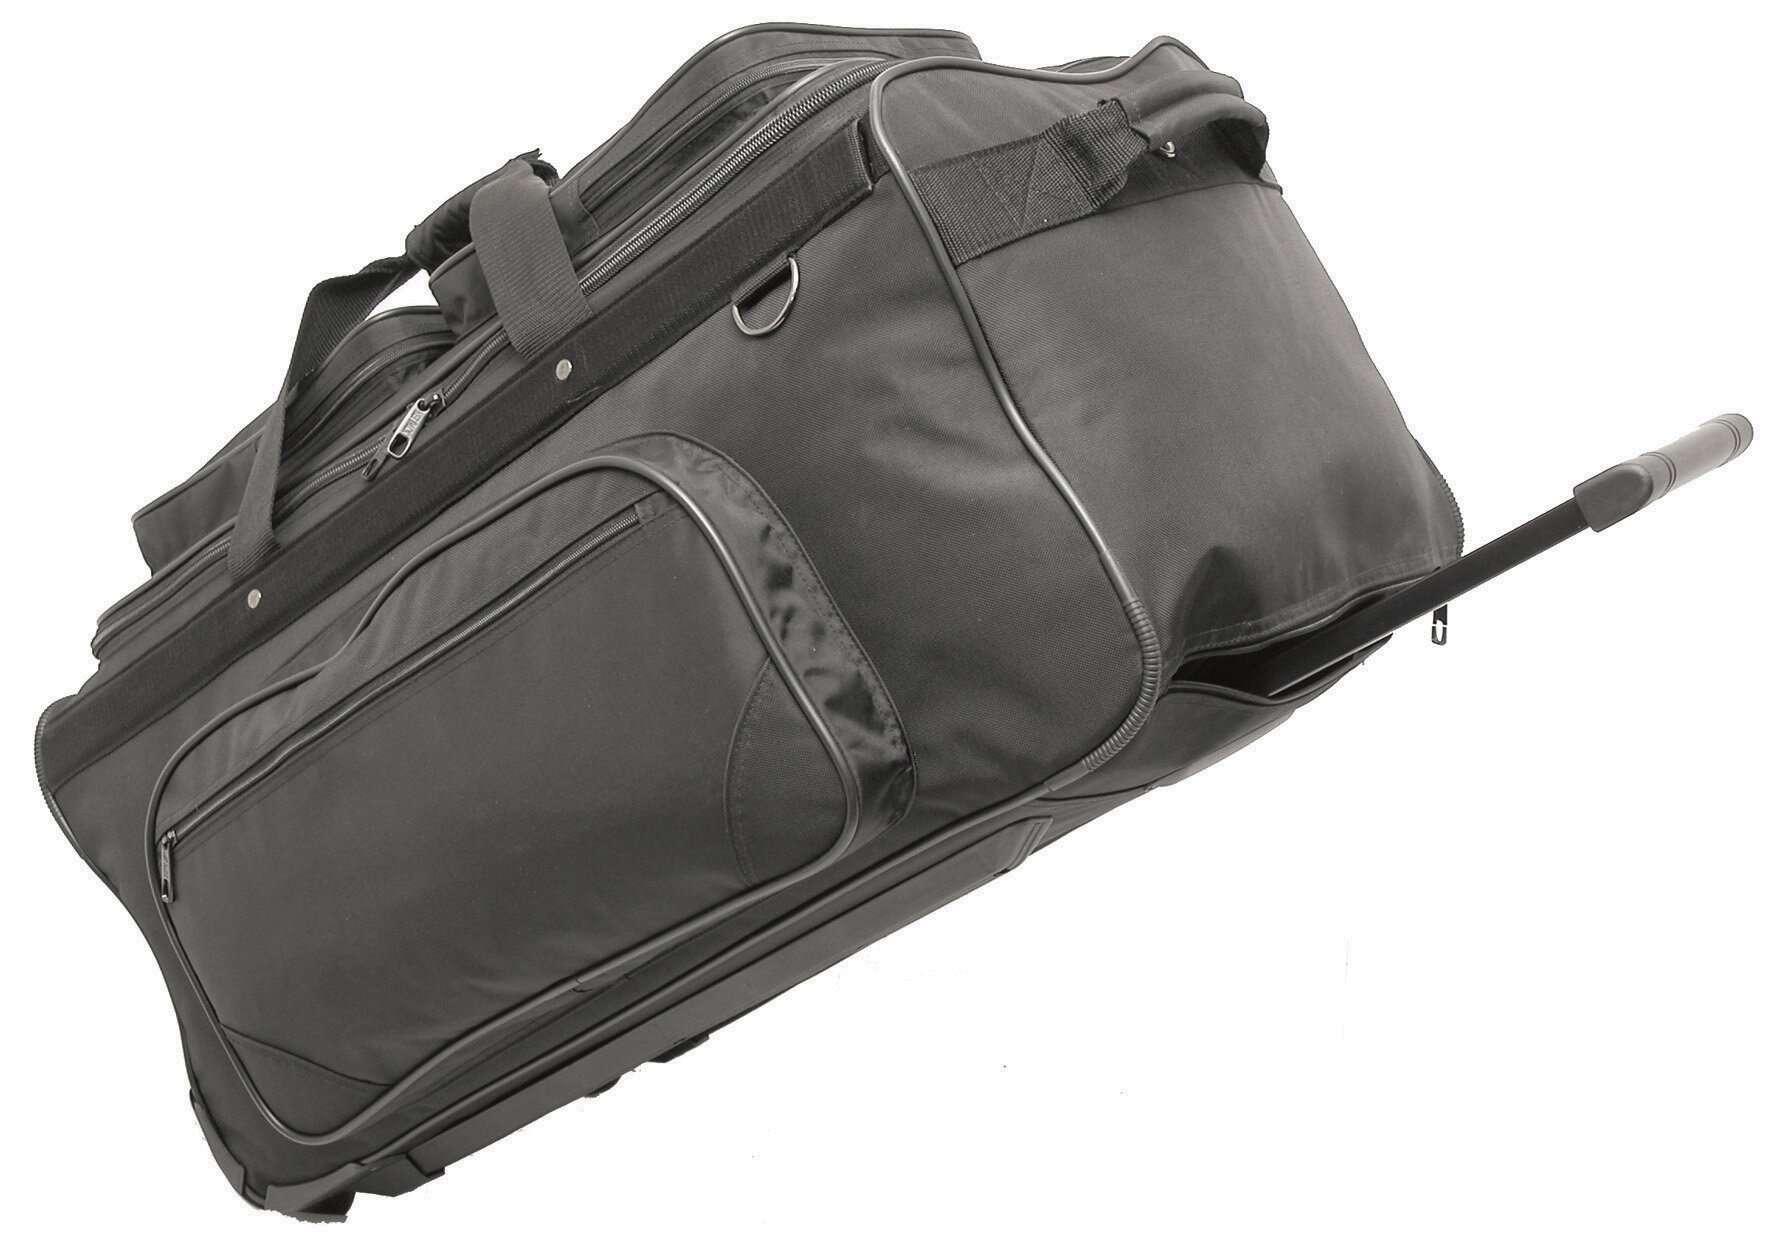 "Netpack Stand Alone 35"" 2 Wheeled Travel Duffel"